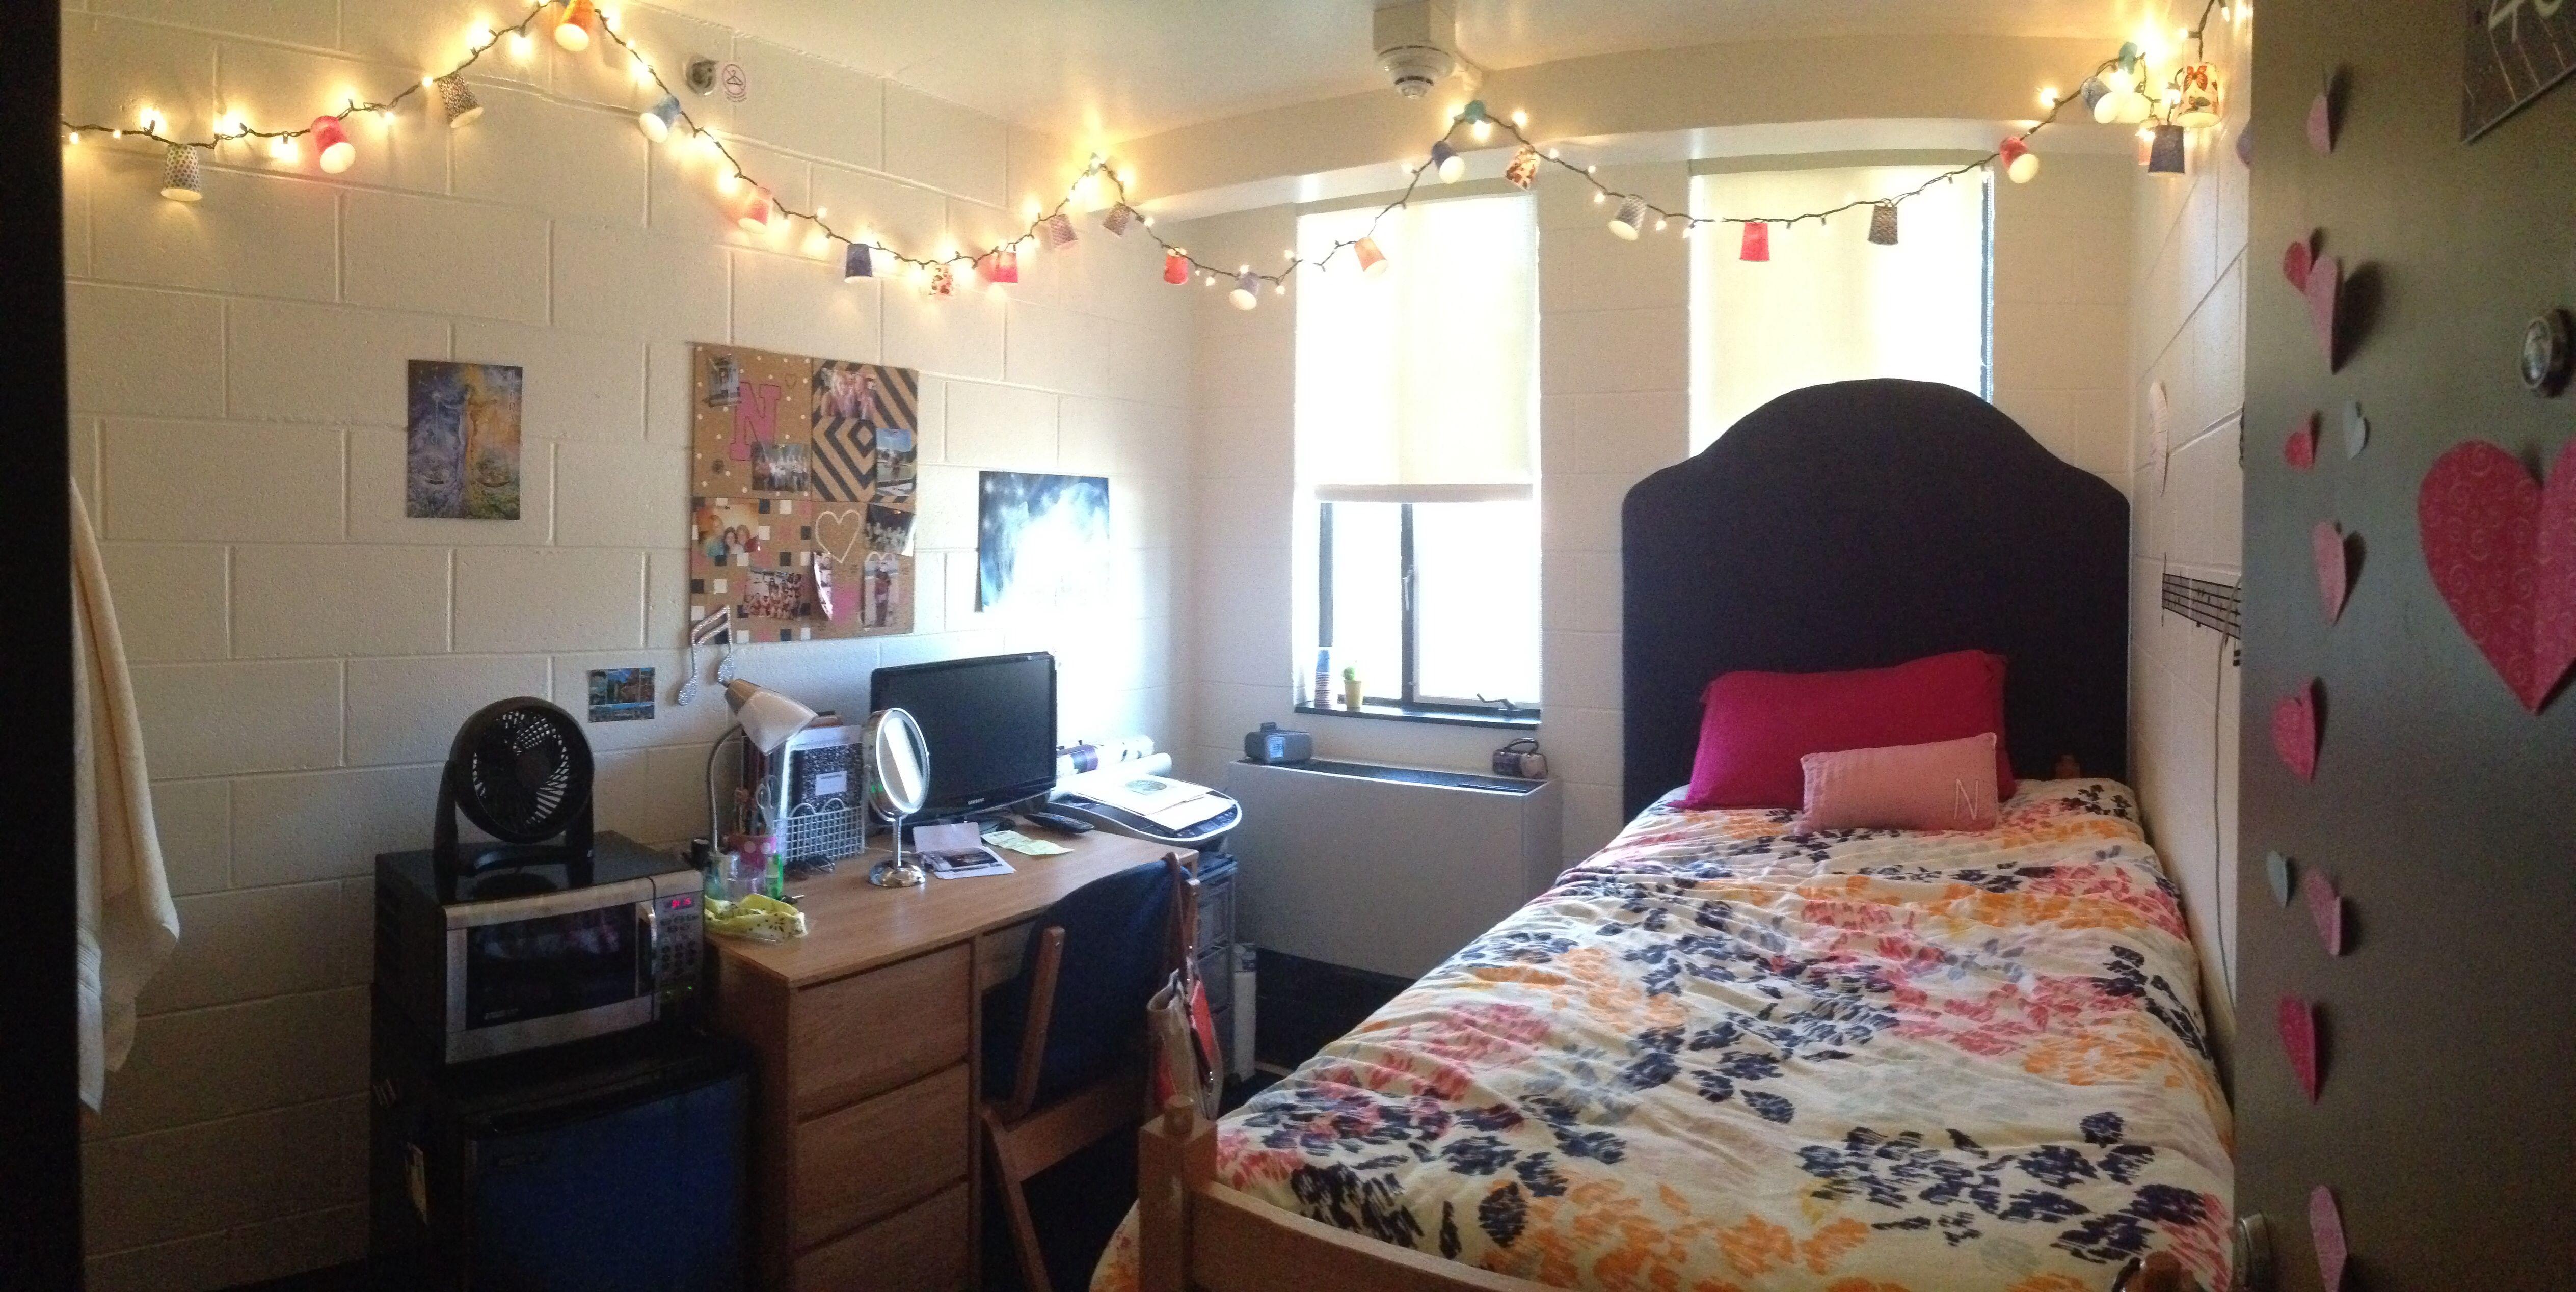 Single dorm room Rodney University of Delaware Urban Outfitters